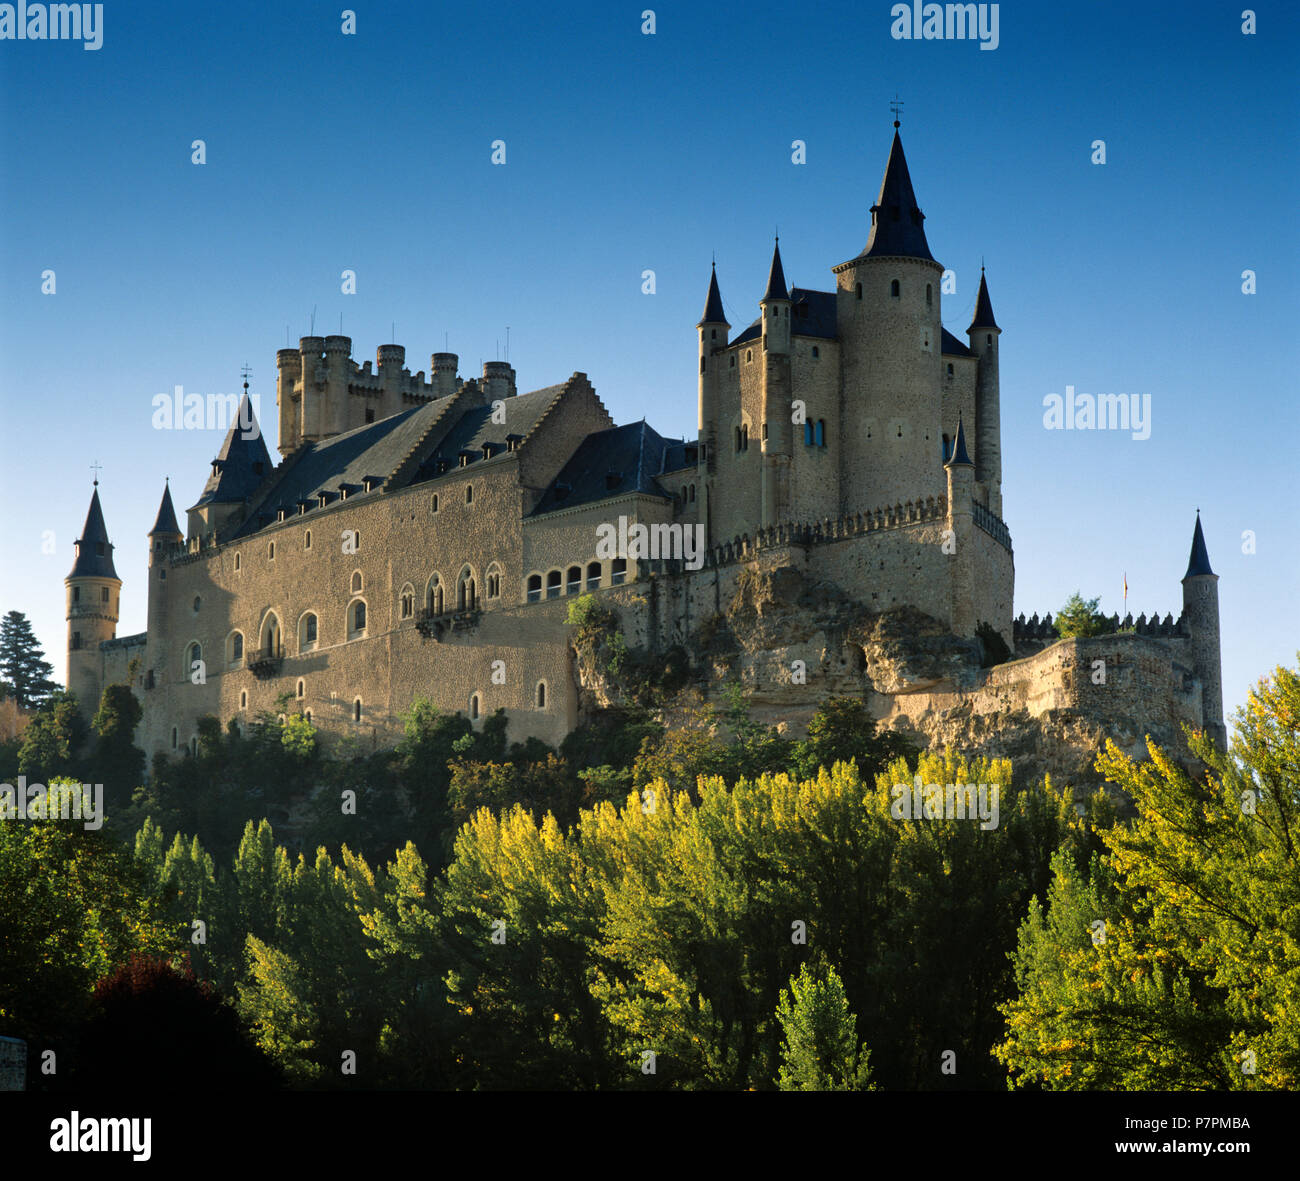 The Alcazar of Segovia, former residence of the Kings of Castile - Stock Image